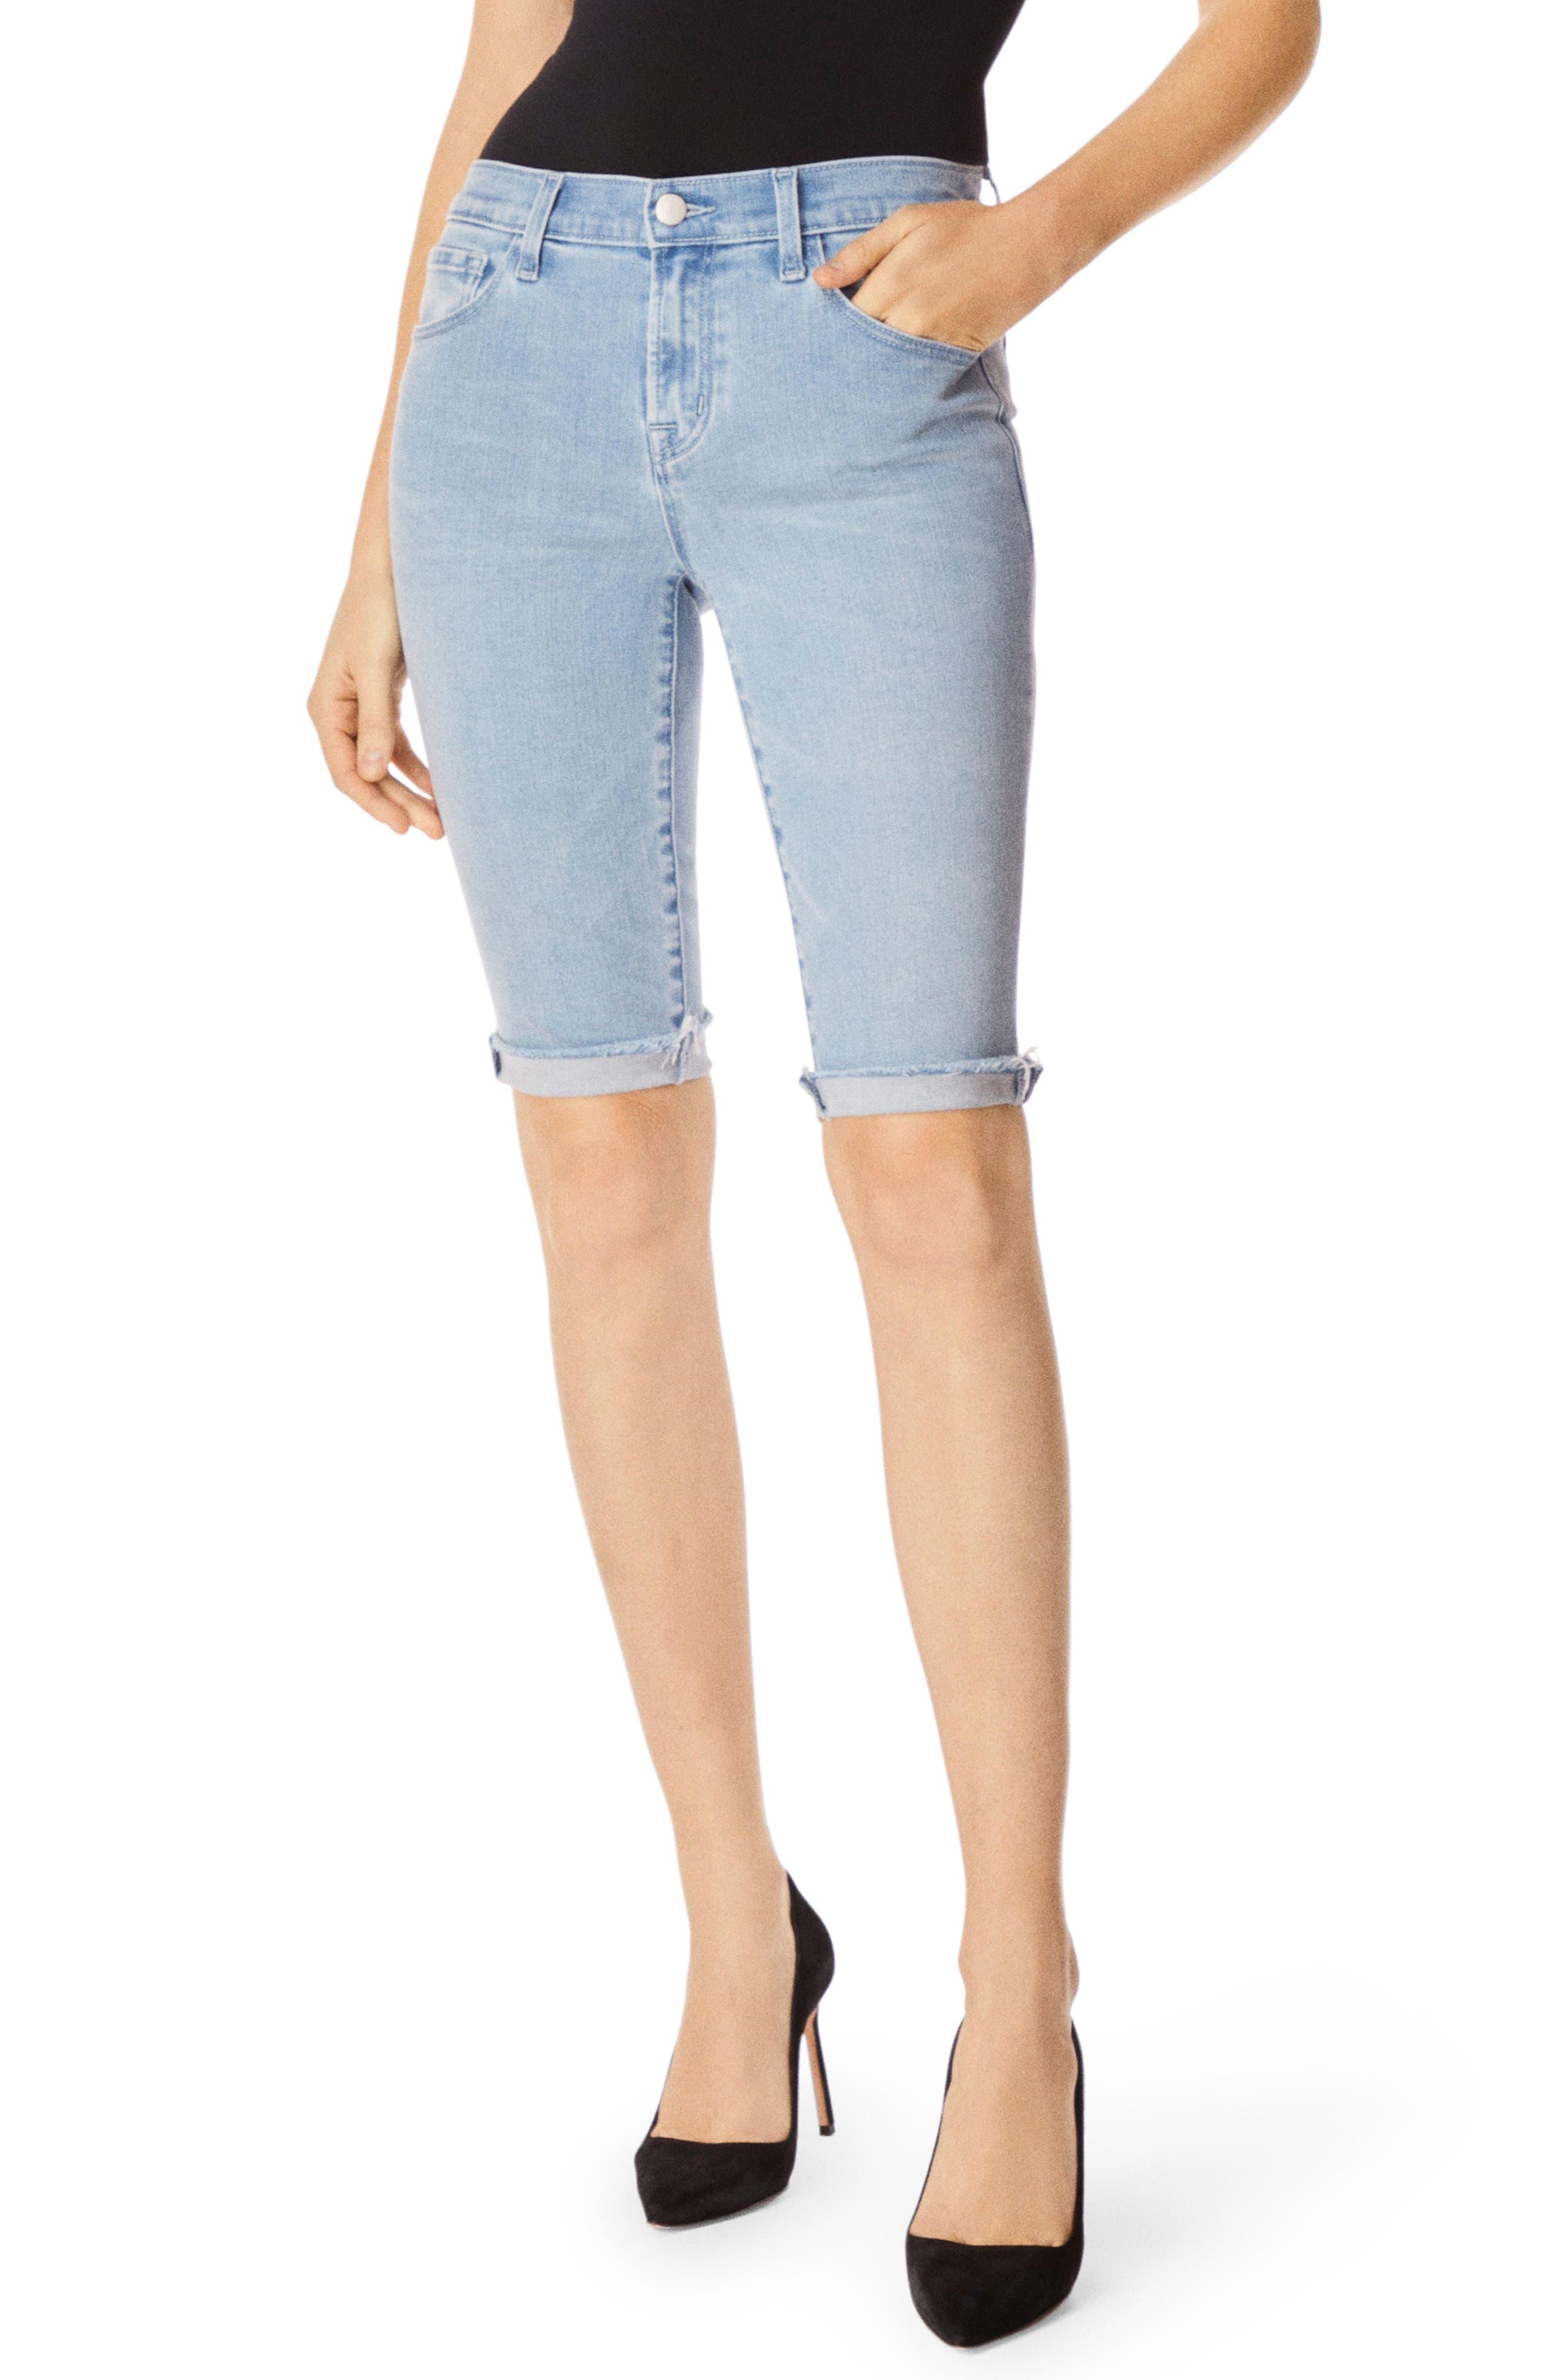 811 Skinny Bermuda Shorts,                             Main thumbnail 1, color,                             VERITY